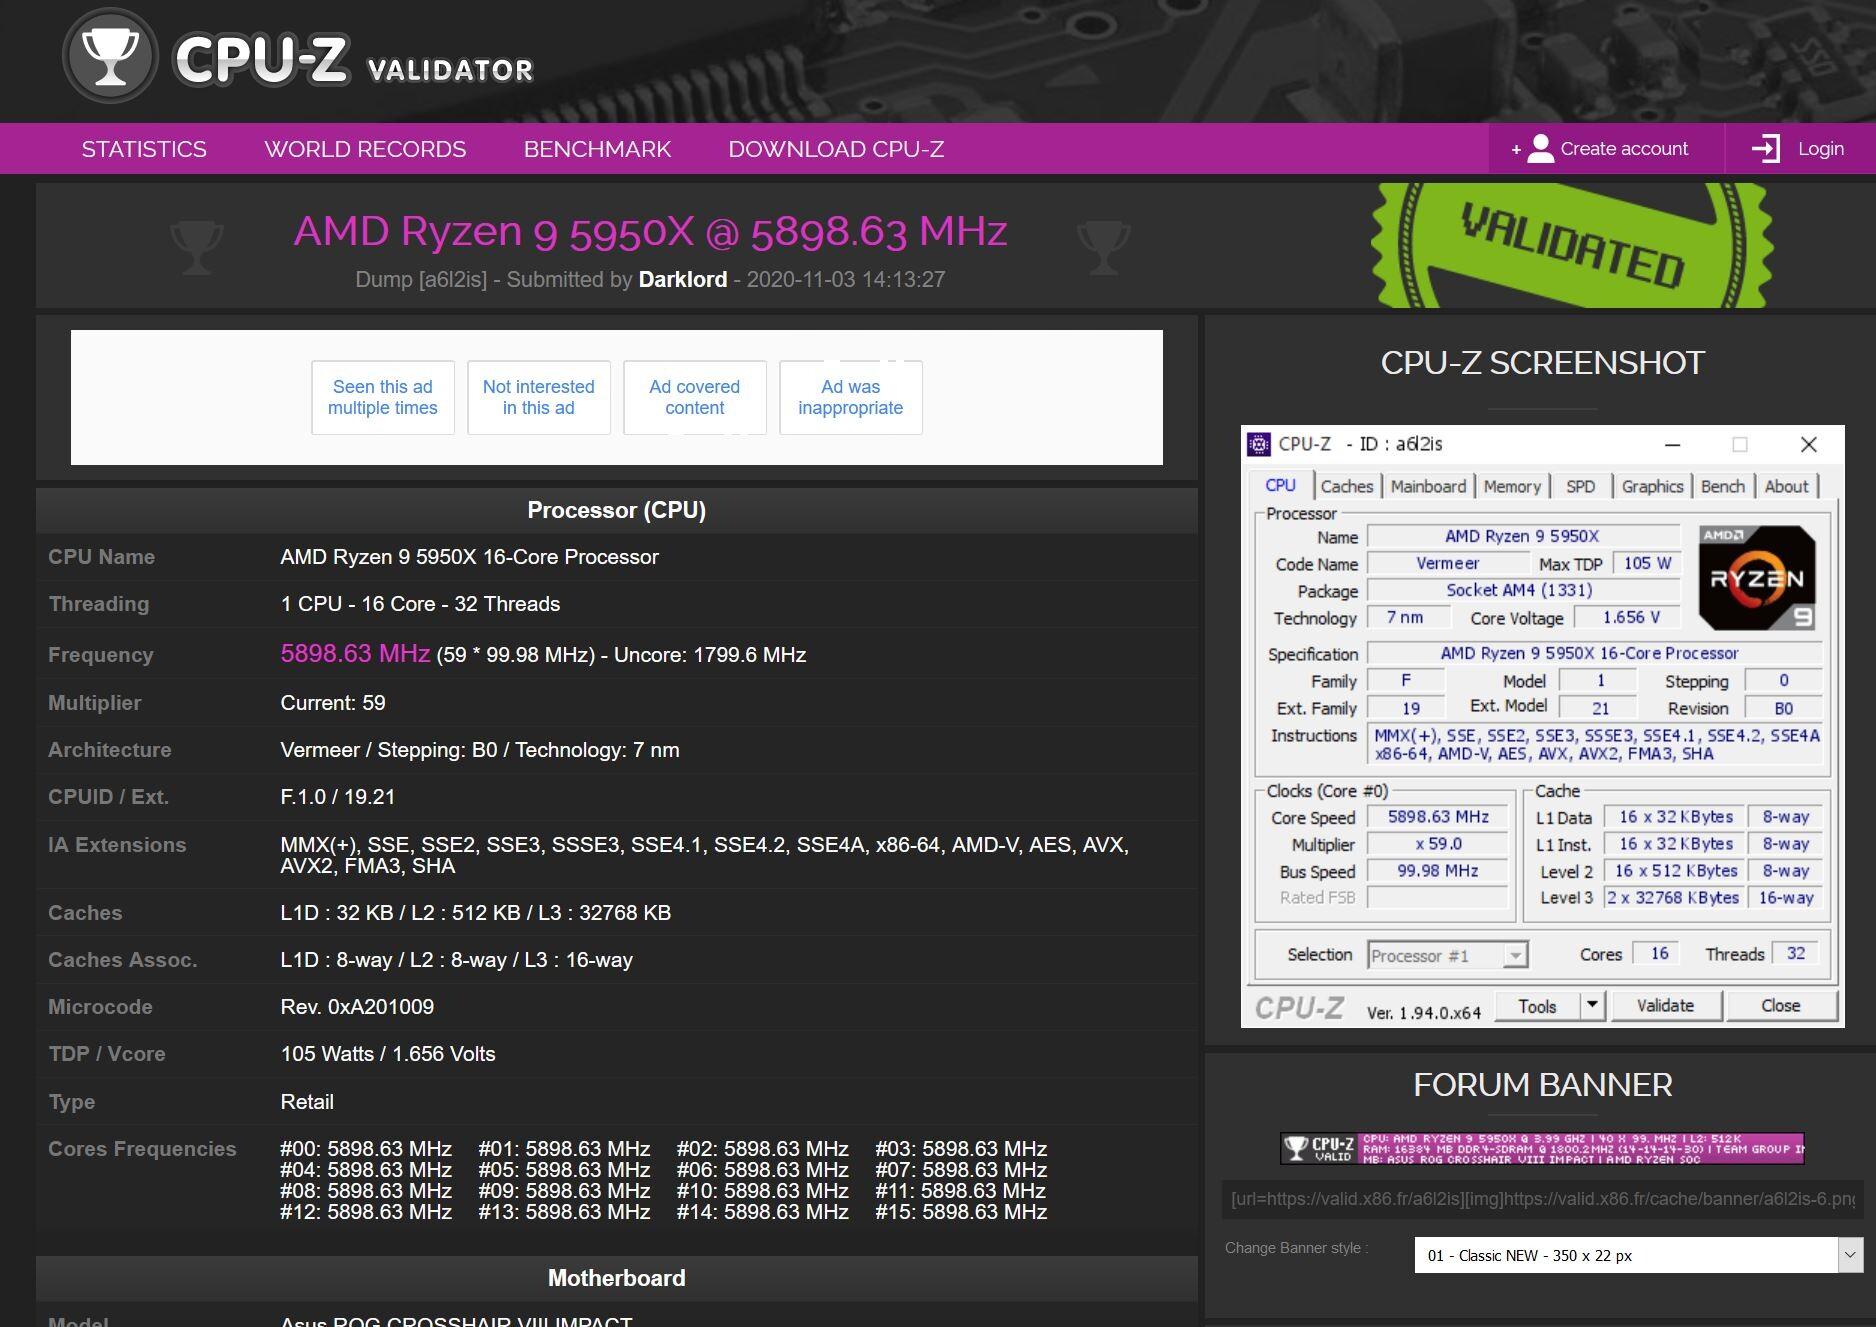 Media asset in full size related to 3dfxzone.it news item entitled as follows: Extreme Overclock: la CPU AMD Ryzen 9 5950X spinta fino alla soglia dei 5.9GHz | Image Name: news31292_Ryzen-9-5950X-CPU-Z-Validator_1.jpg